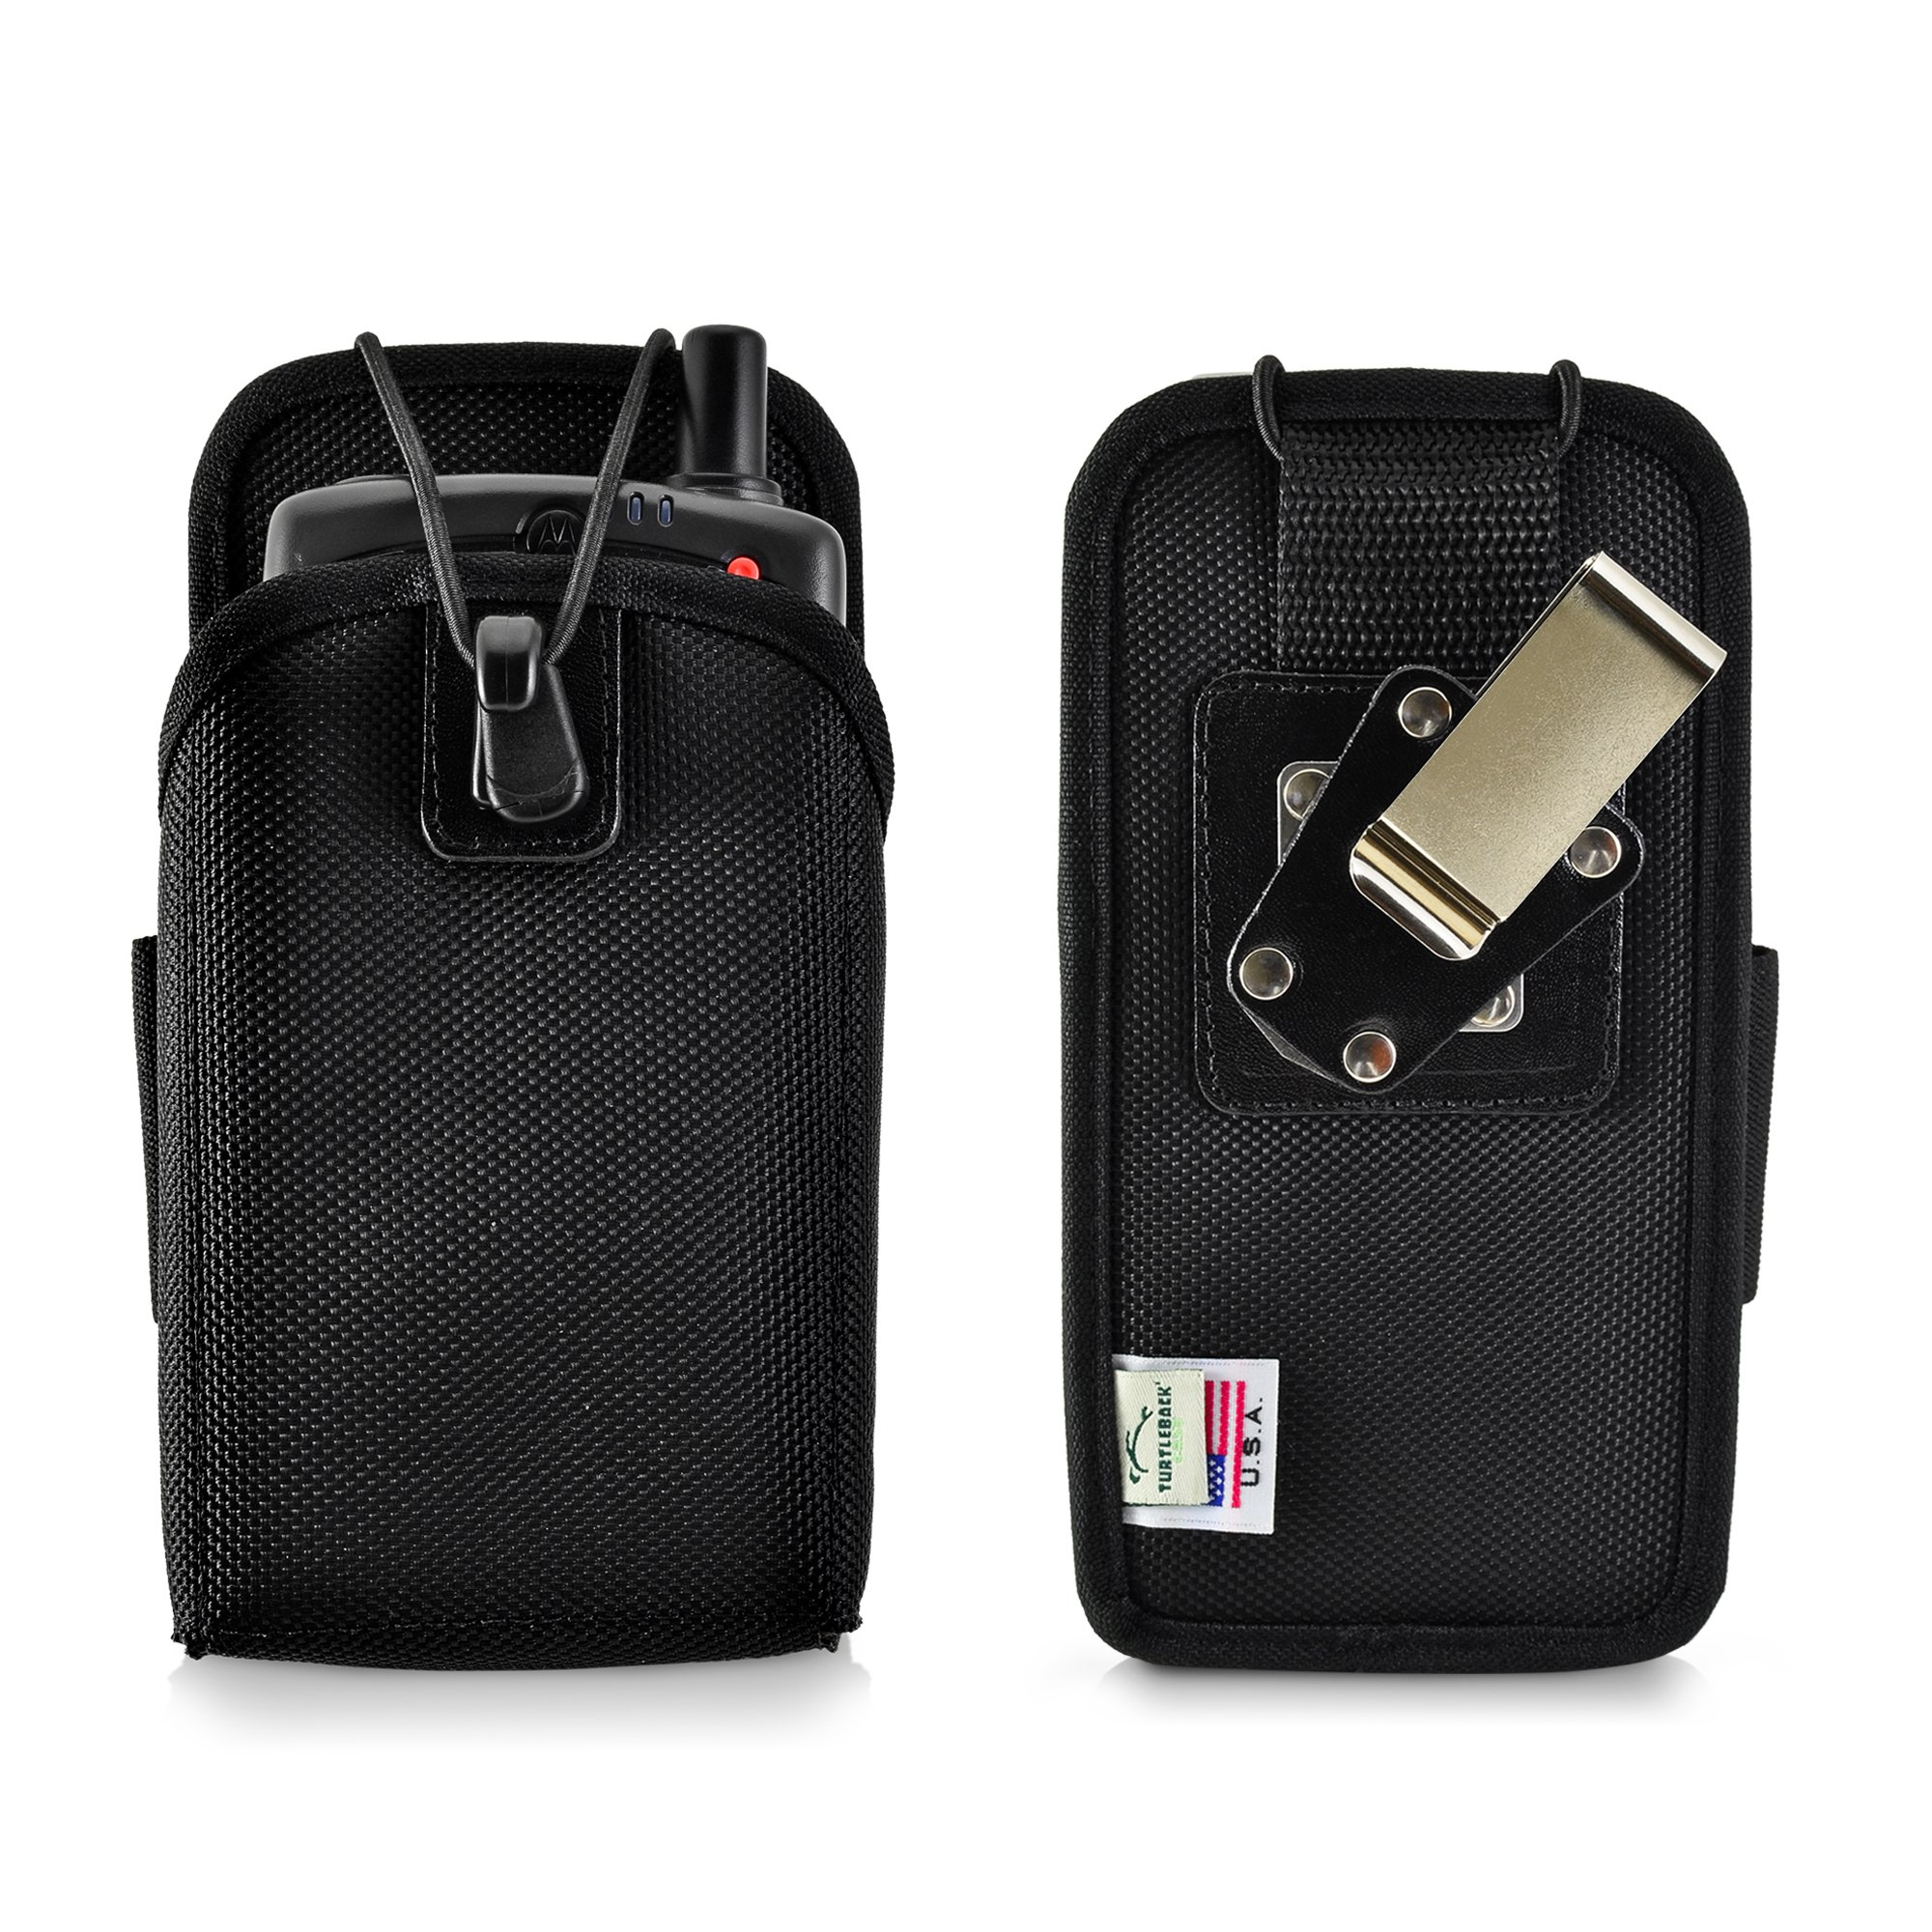 Turtleback Mobile Computer Case made for Zebra Motorola MC75 Touch Computer Nylon Holster, 2 Belt Clips (Metal Clip & Belt Loop) Mobile Scanner Holder Fits devices 6 1/2''X 3 3/8''X 1 3/4''